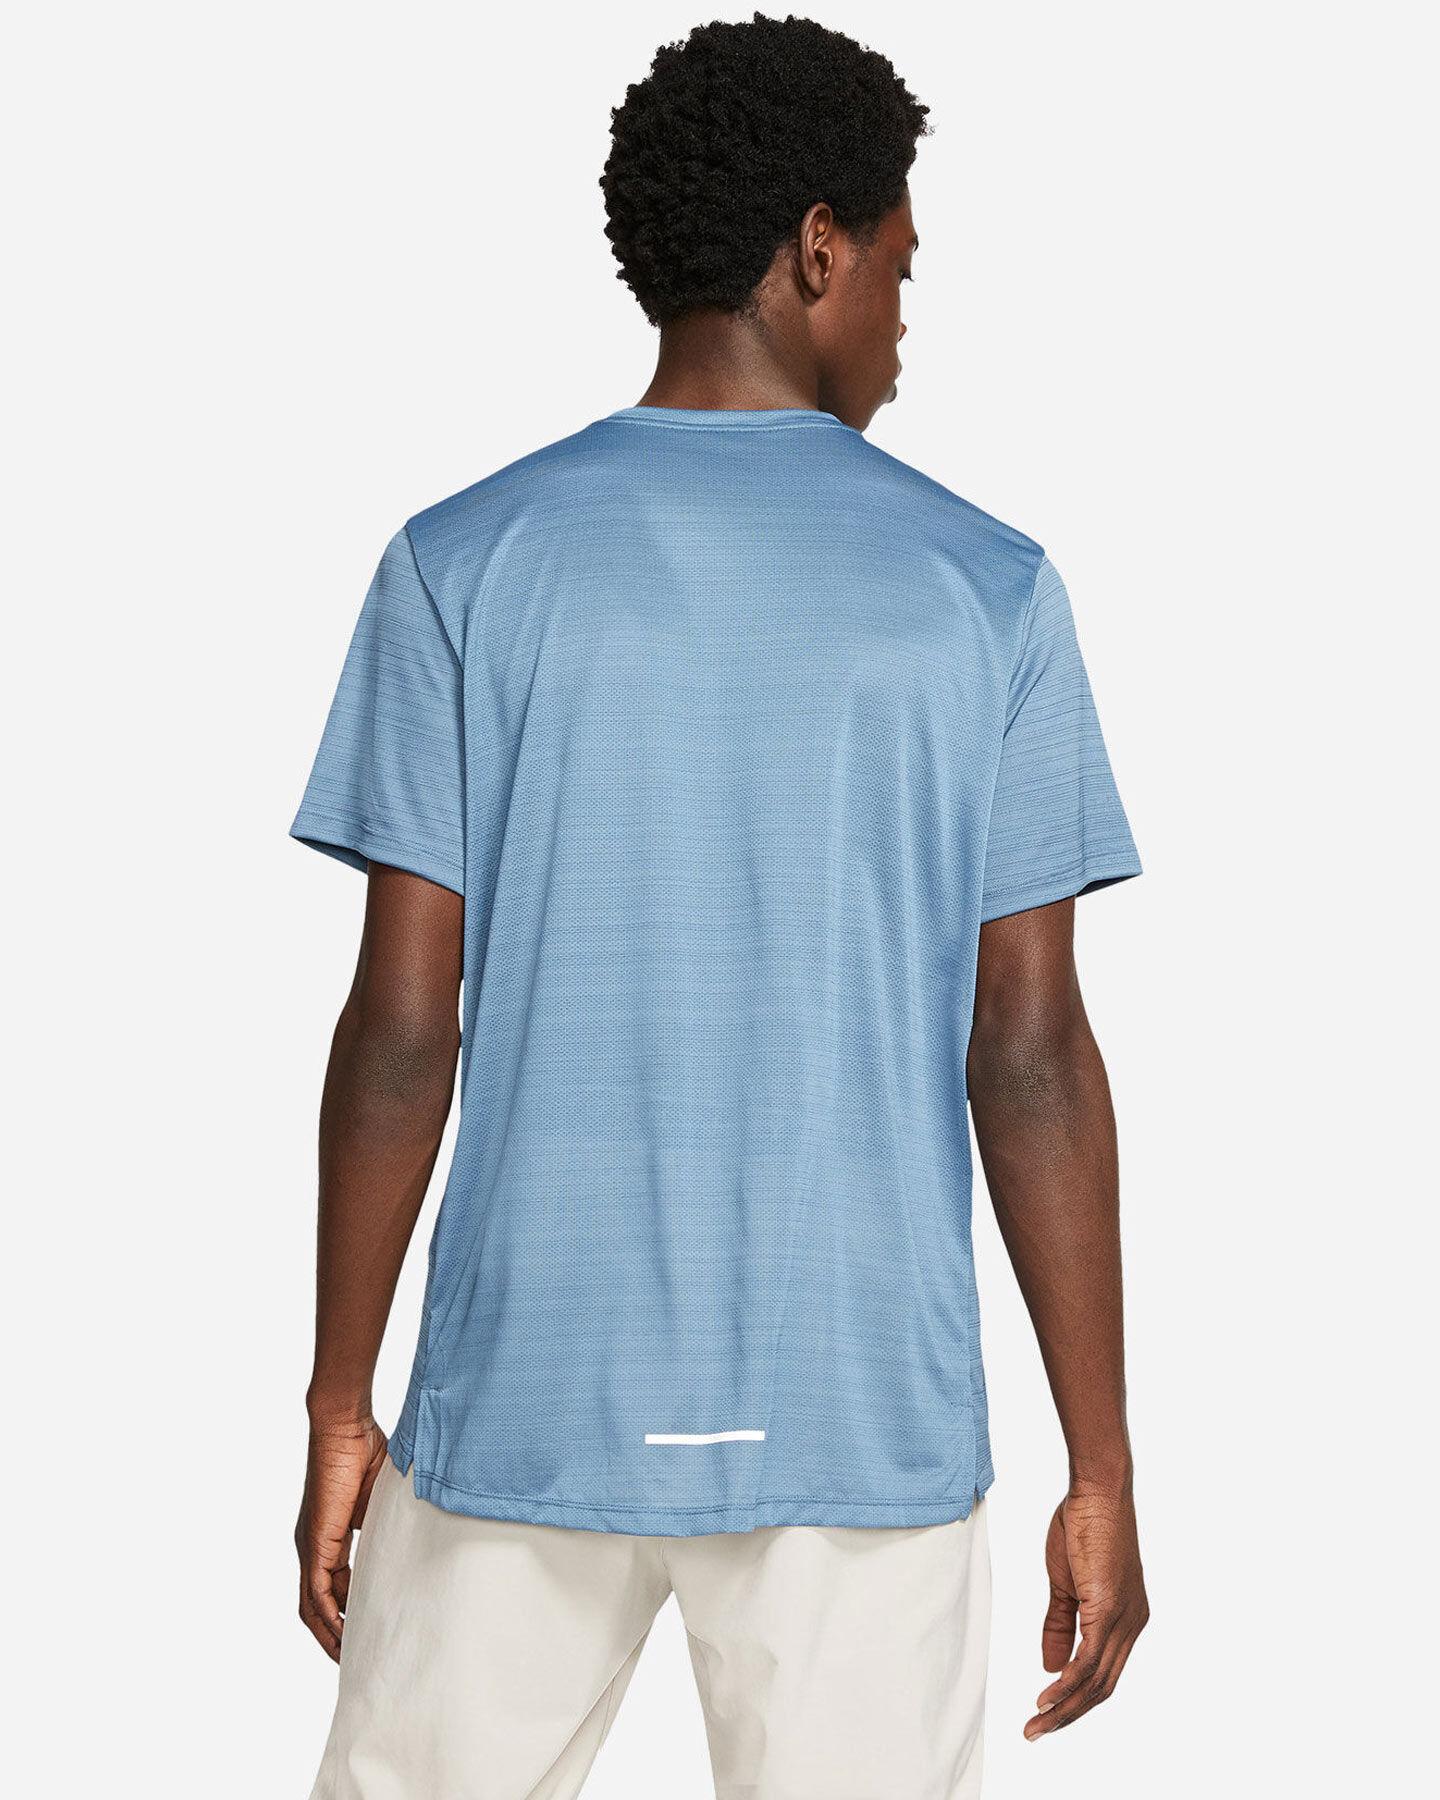 T-Shirt running NIKE DRI-FIT MILER M S5194863 scatto 1